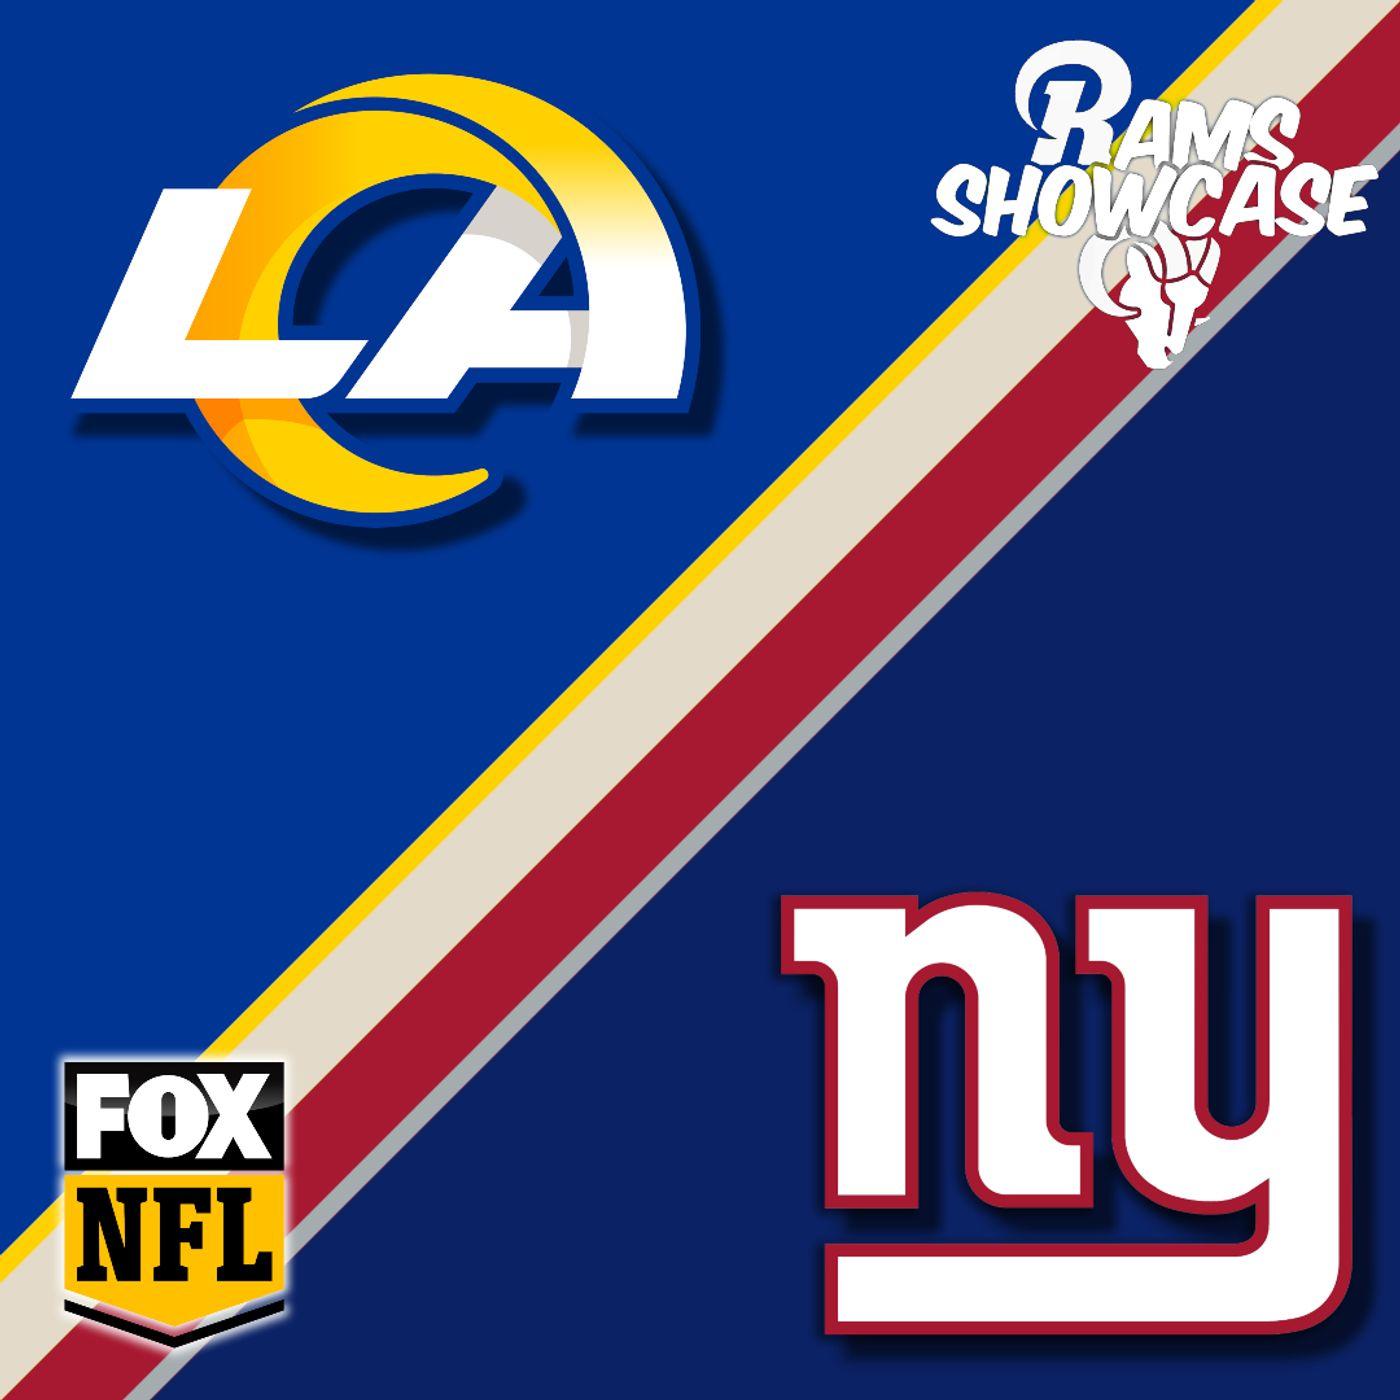 Rams Showcase - Rams @ Giants